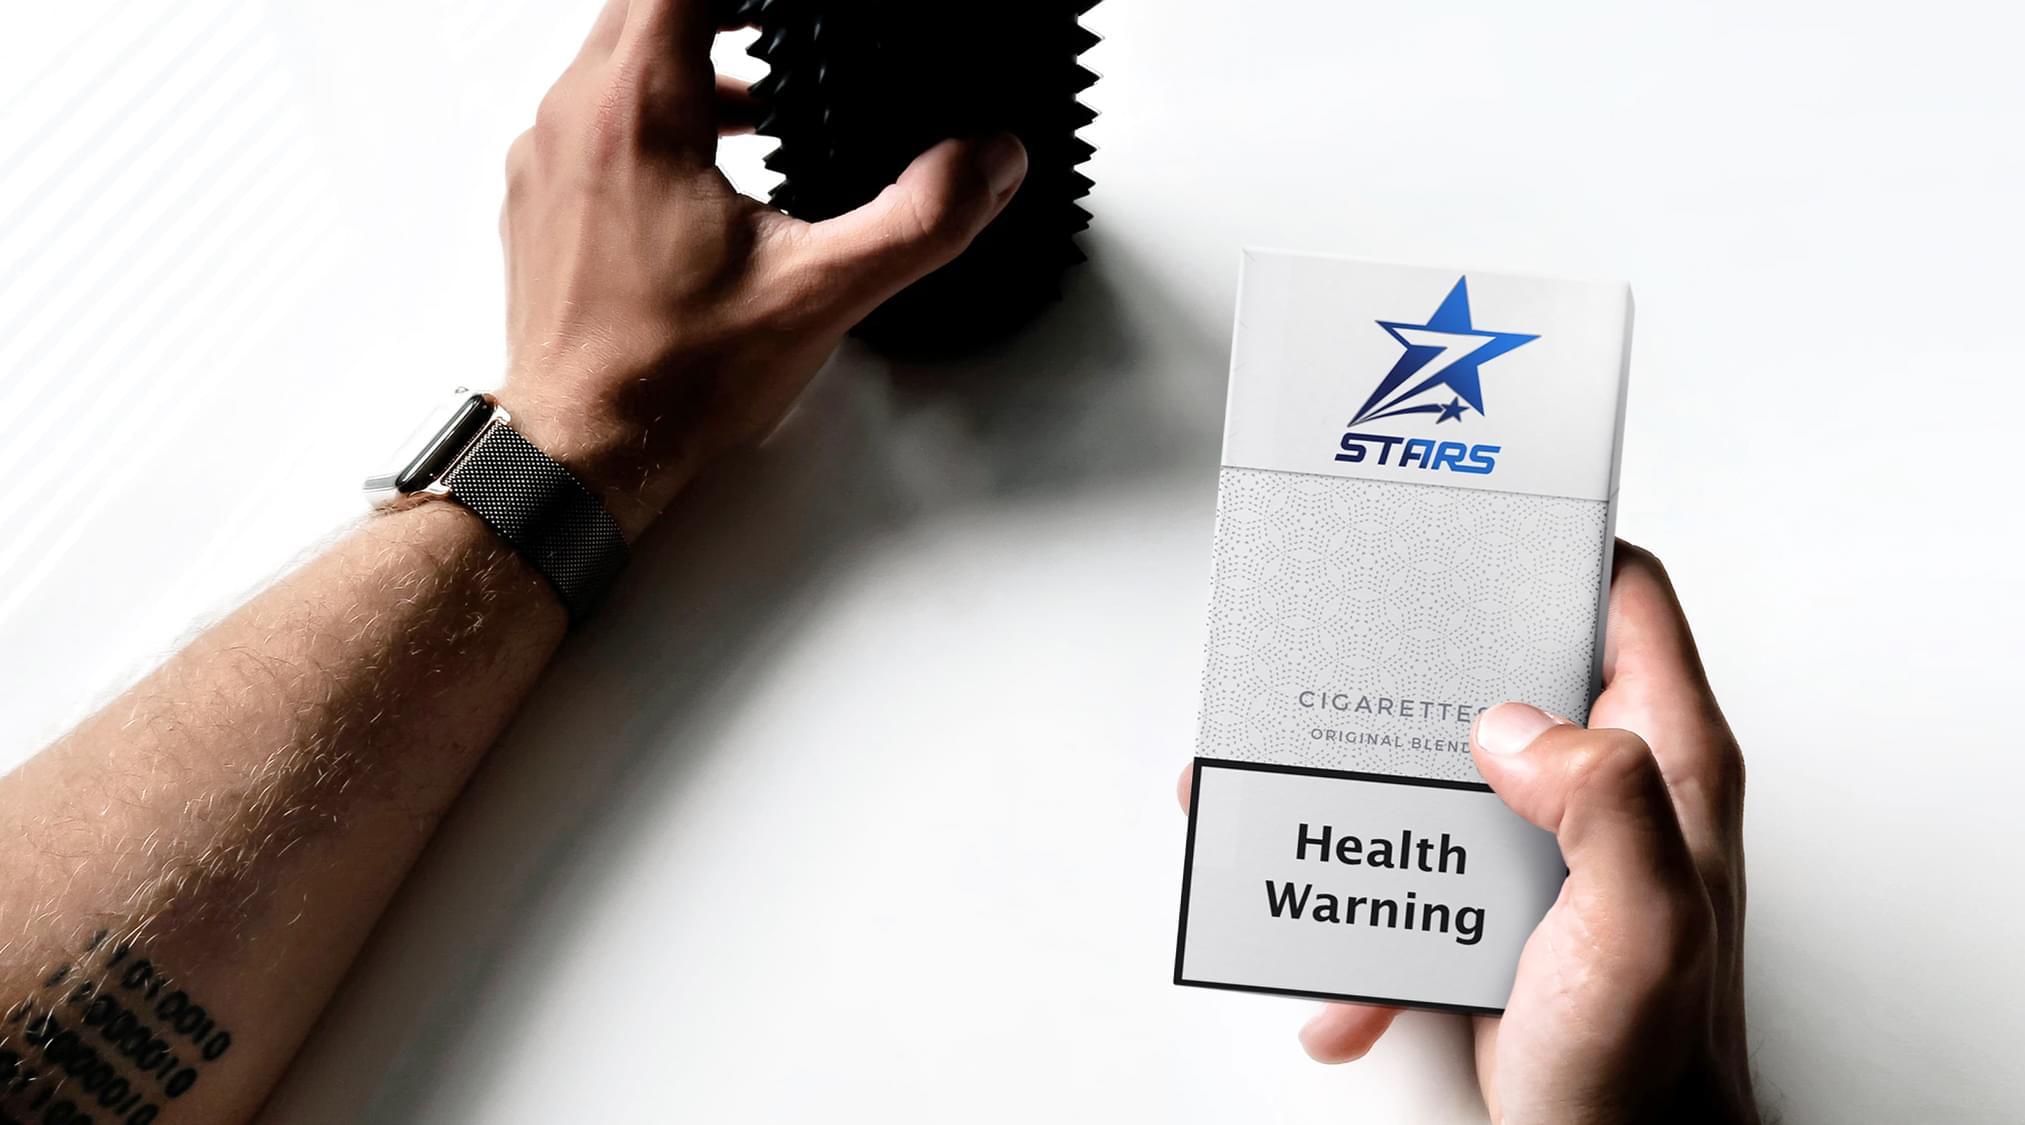 7 Stars Packaging